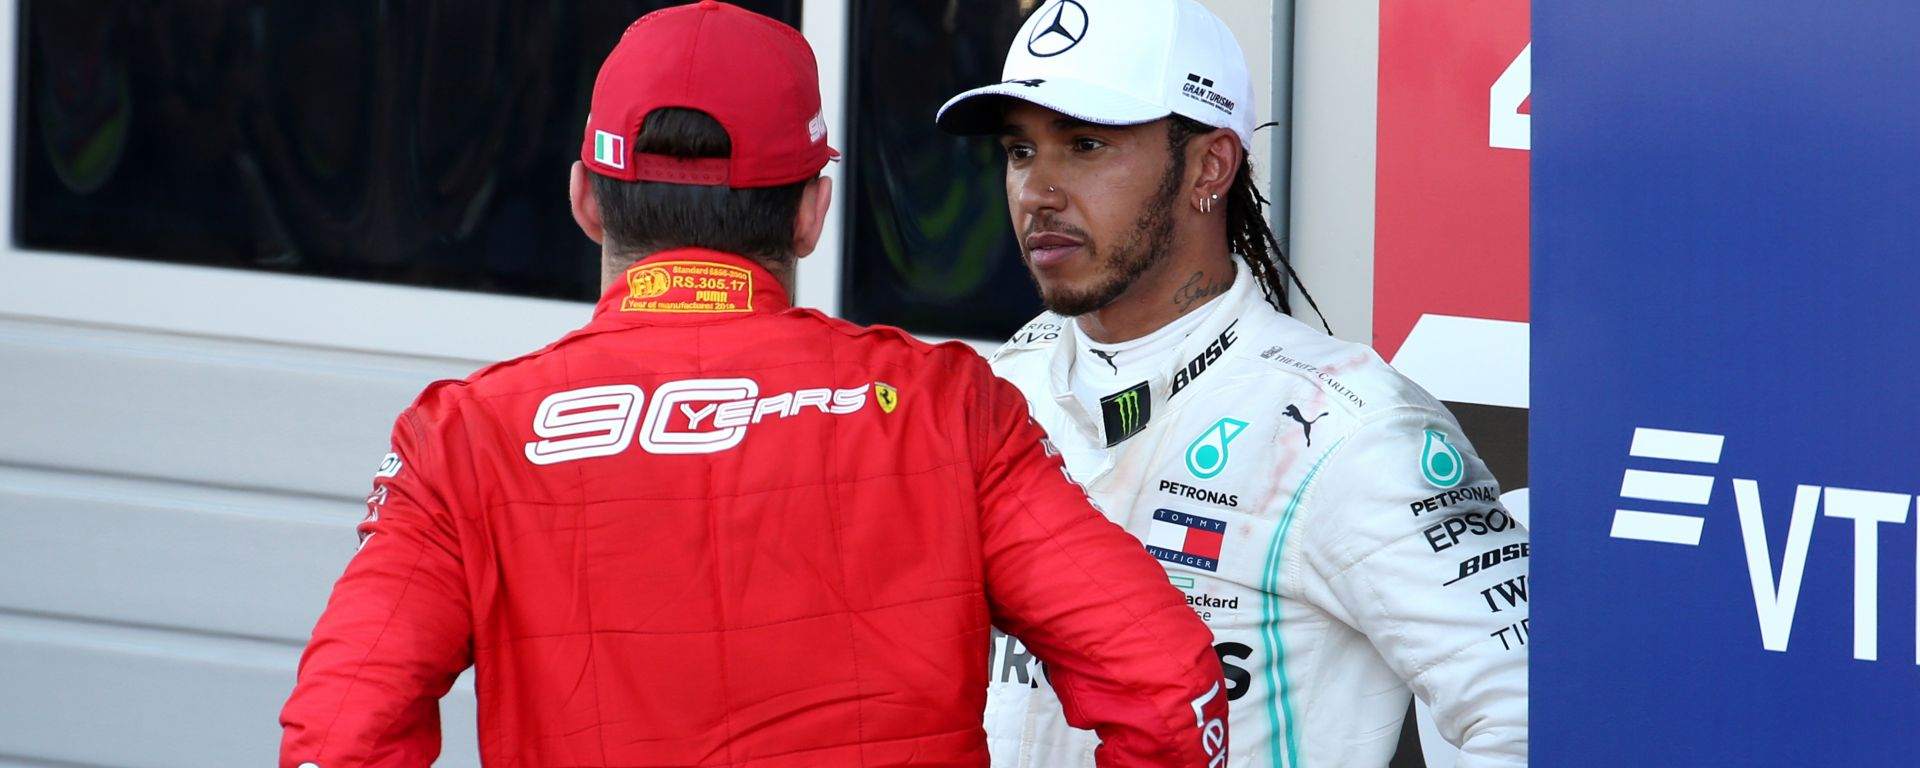 F1: Lewis Hamilton (Mercedes) e Charles Leclerc (Ferrari)